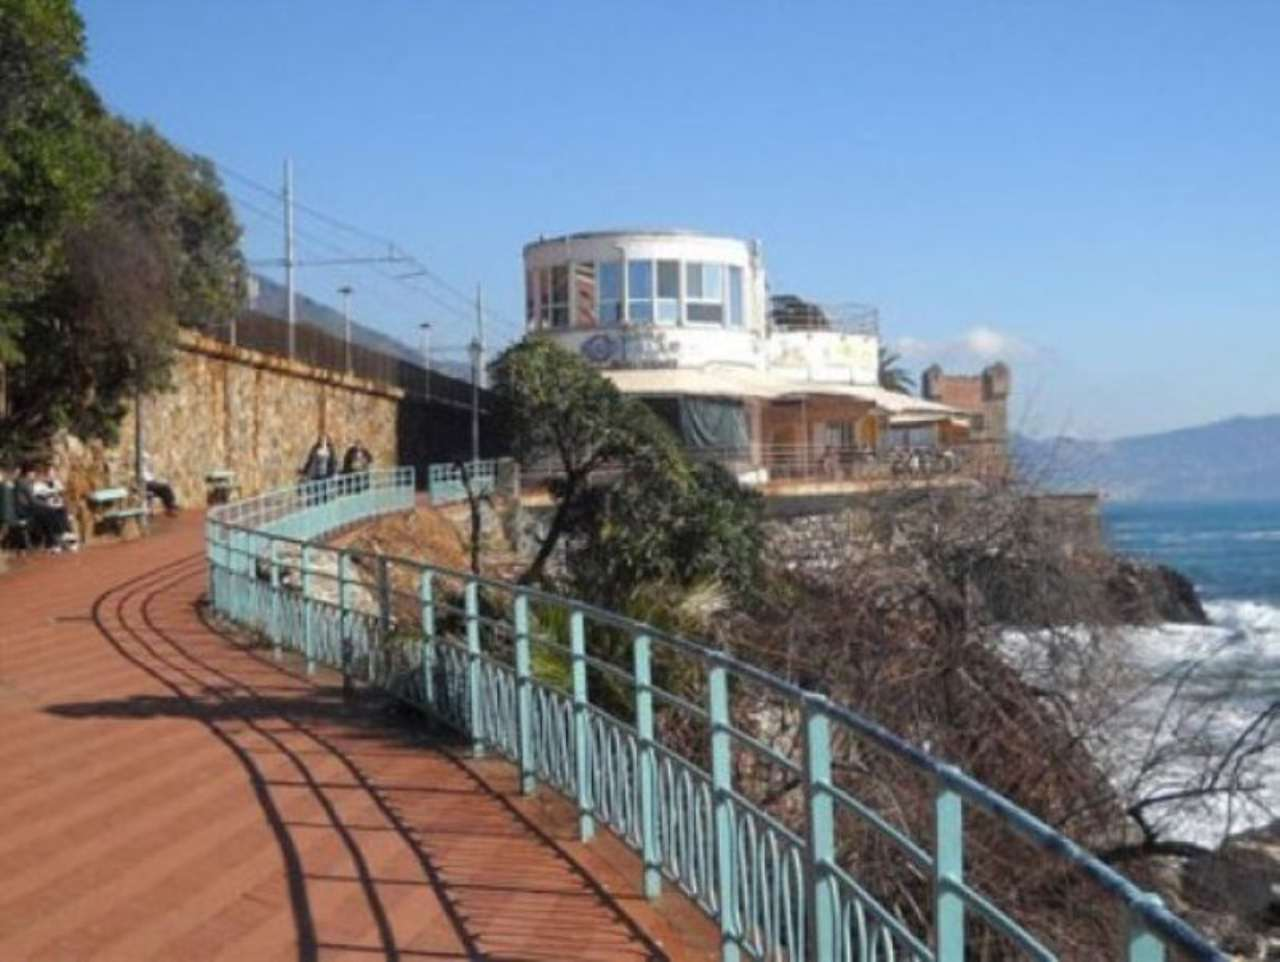 Bilocale Genova Via Felice Gazzolo 4